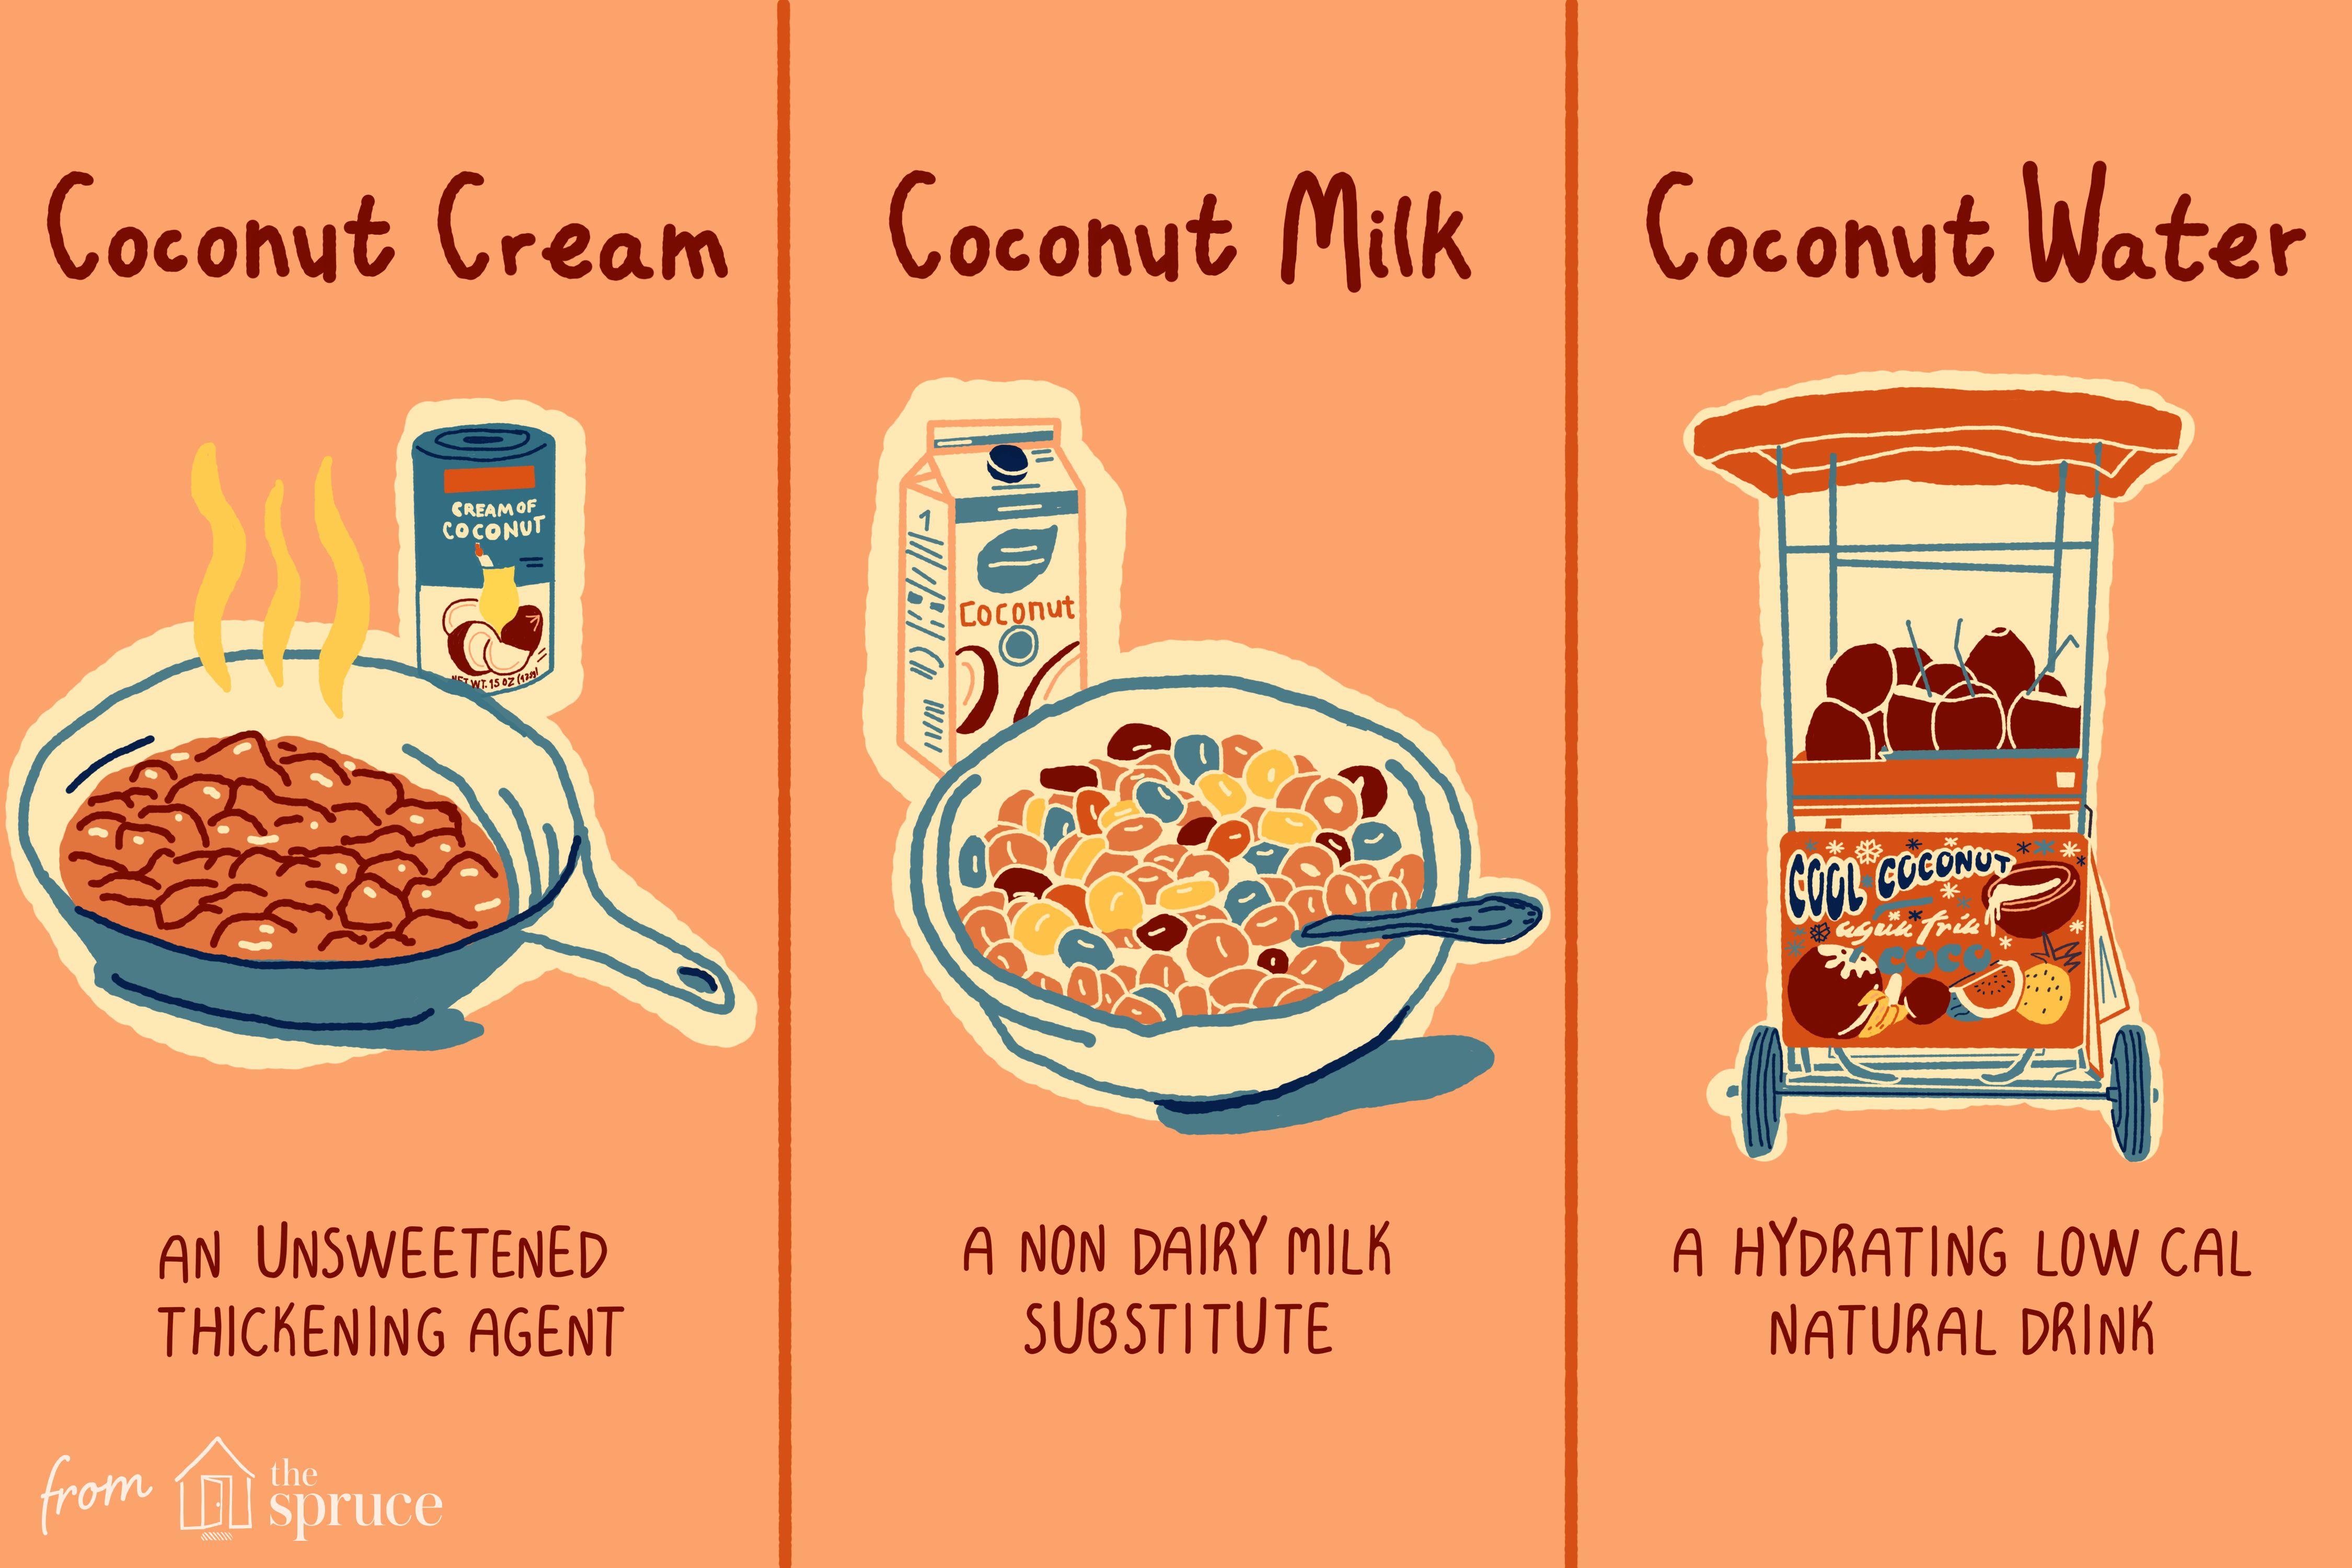 Coconut Cream, Milk and Water Chart